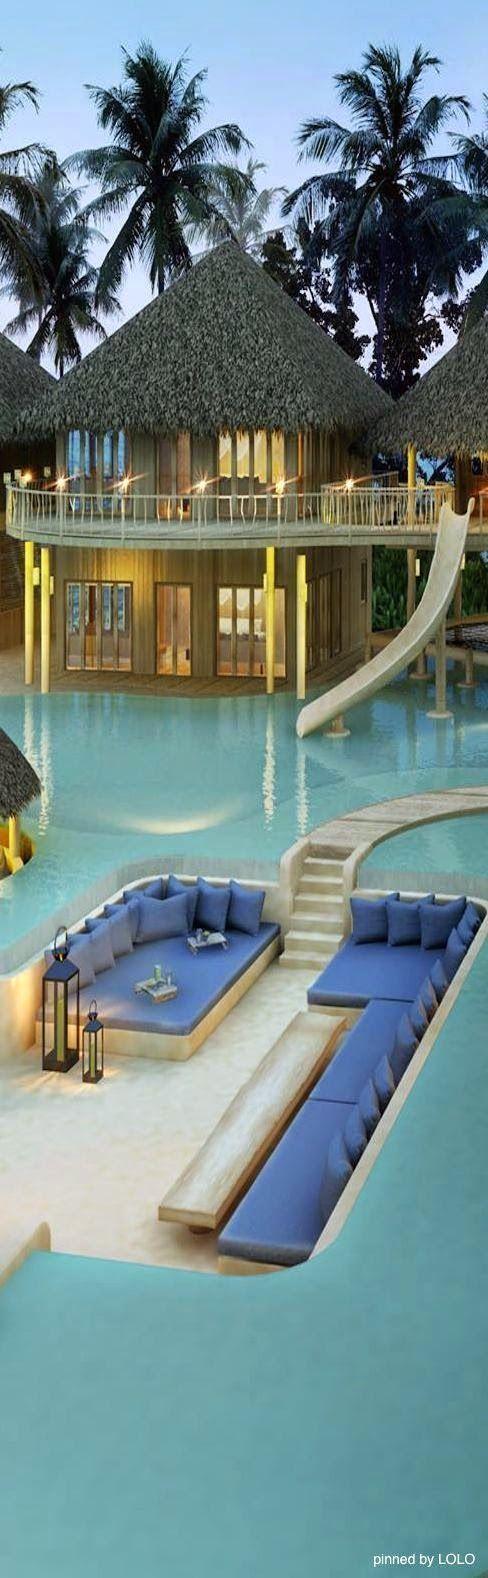 Soneva Fushi Resort - The Maldives ~ Fascinating Places To Travel